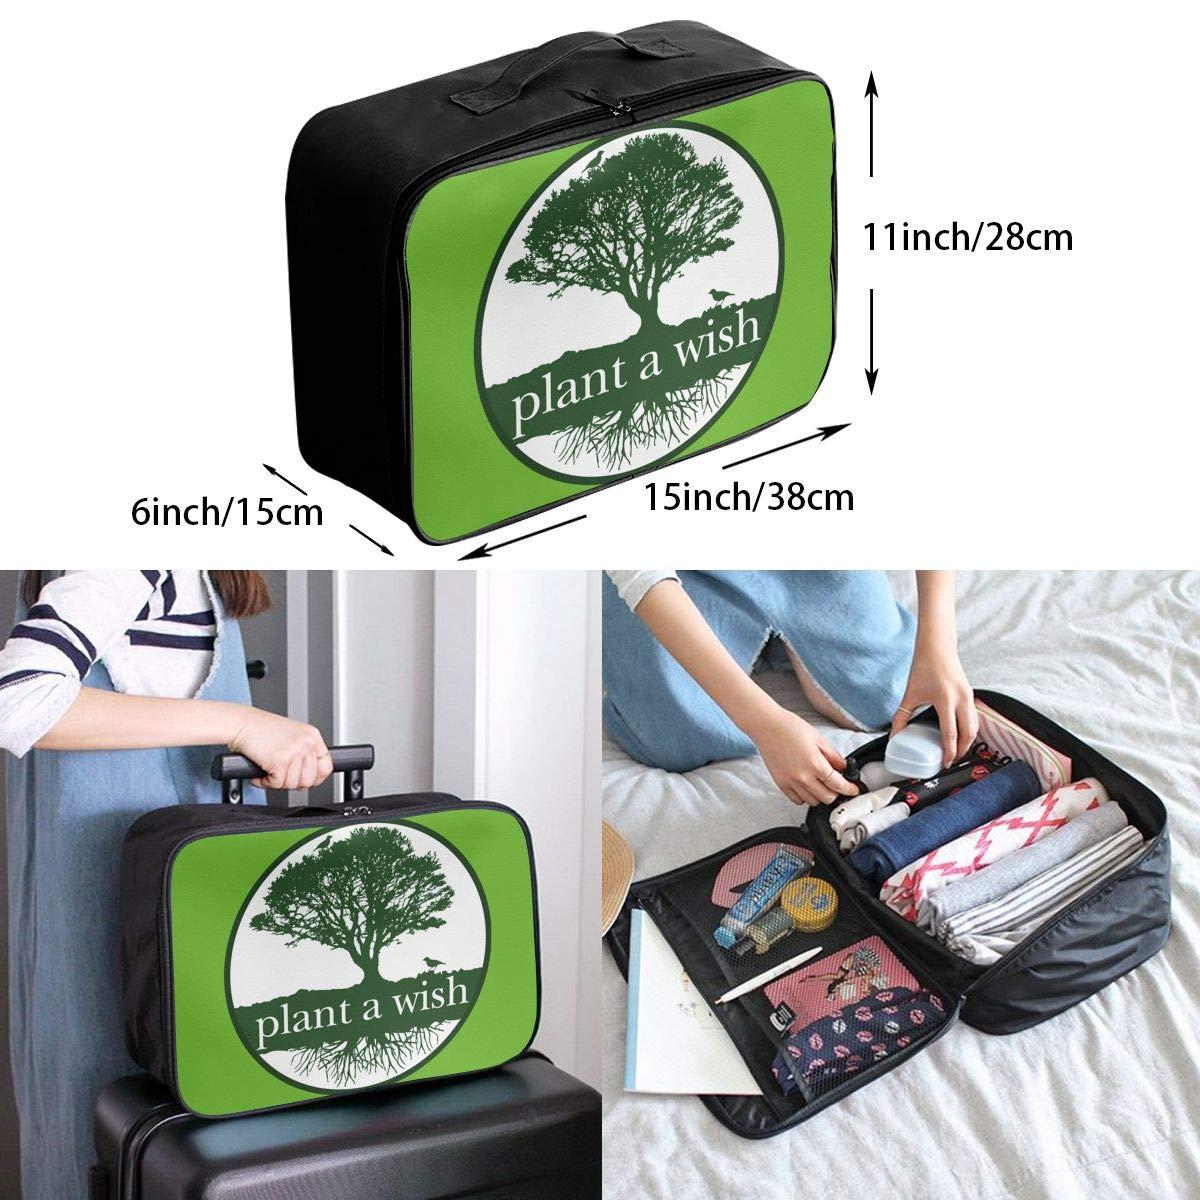 Travel Luggage Duffle Bag Lightweight Portable Handbag Plant A Wish Large Capacity Waterproof Foldable Storage Tote